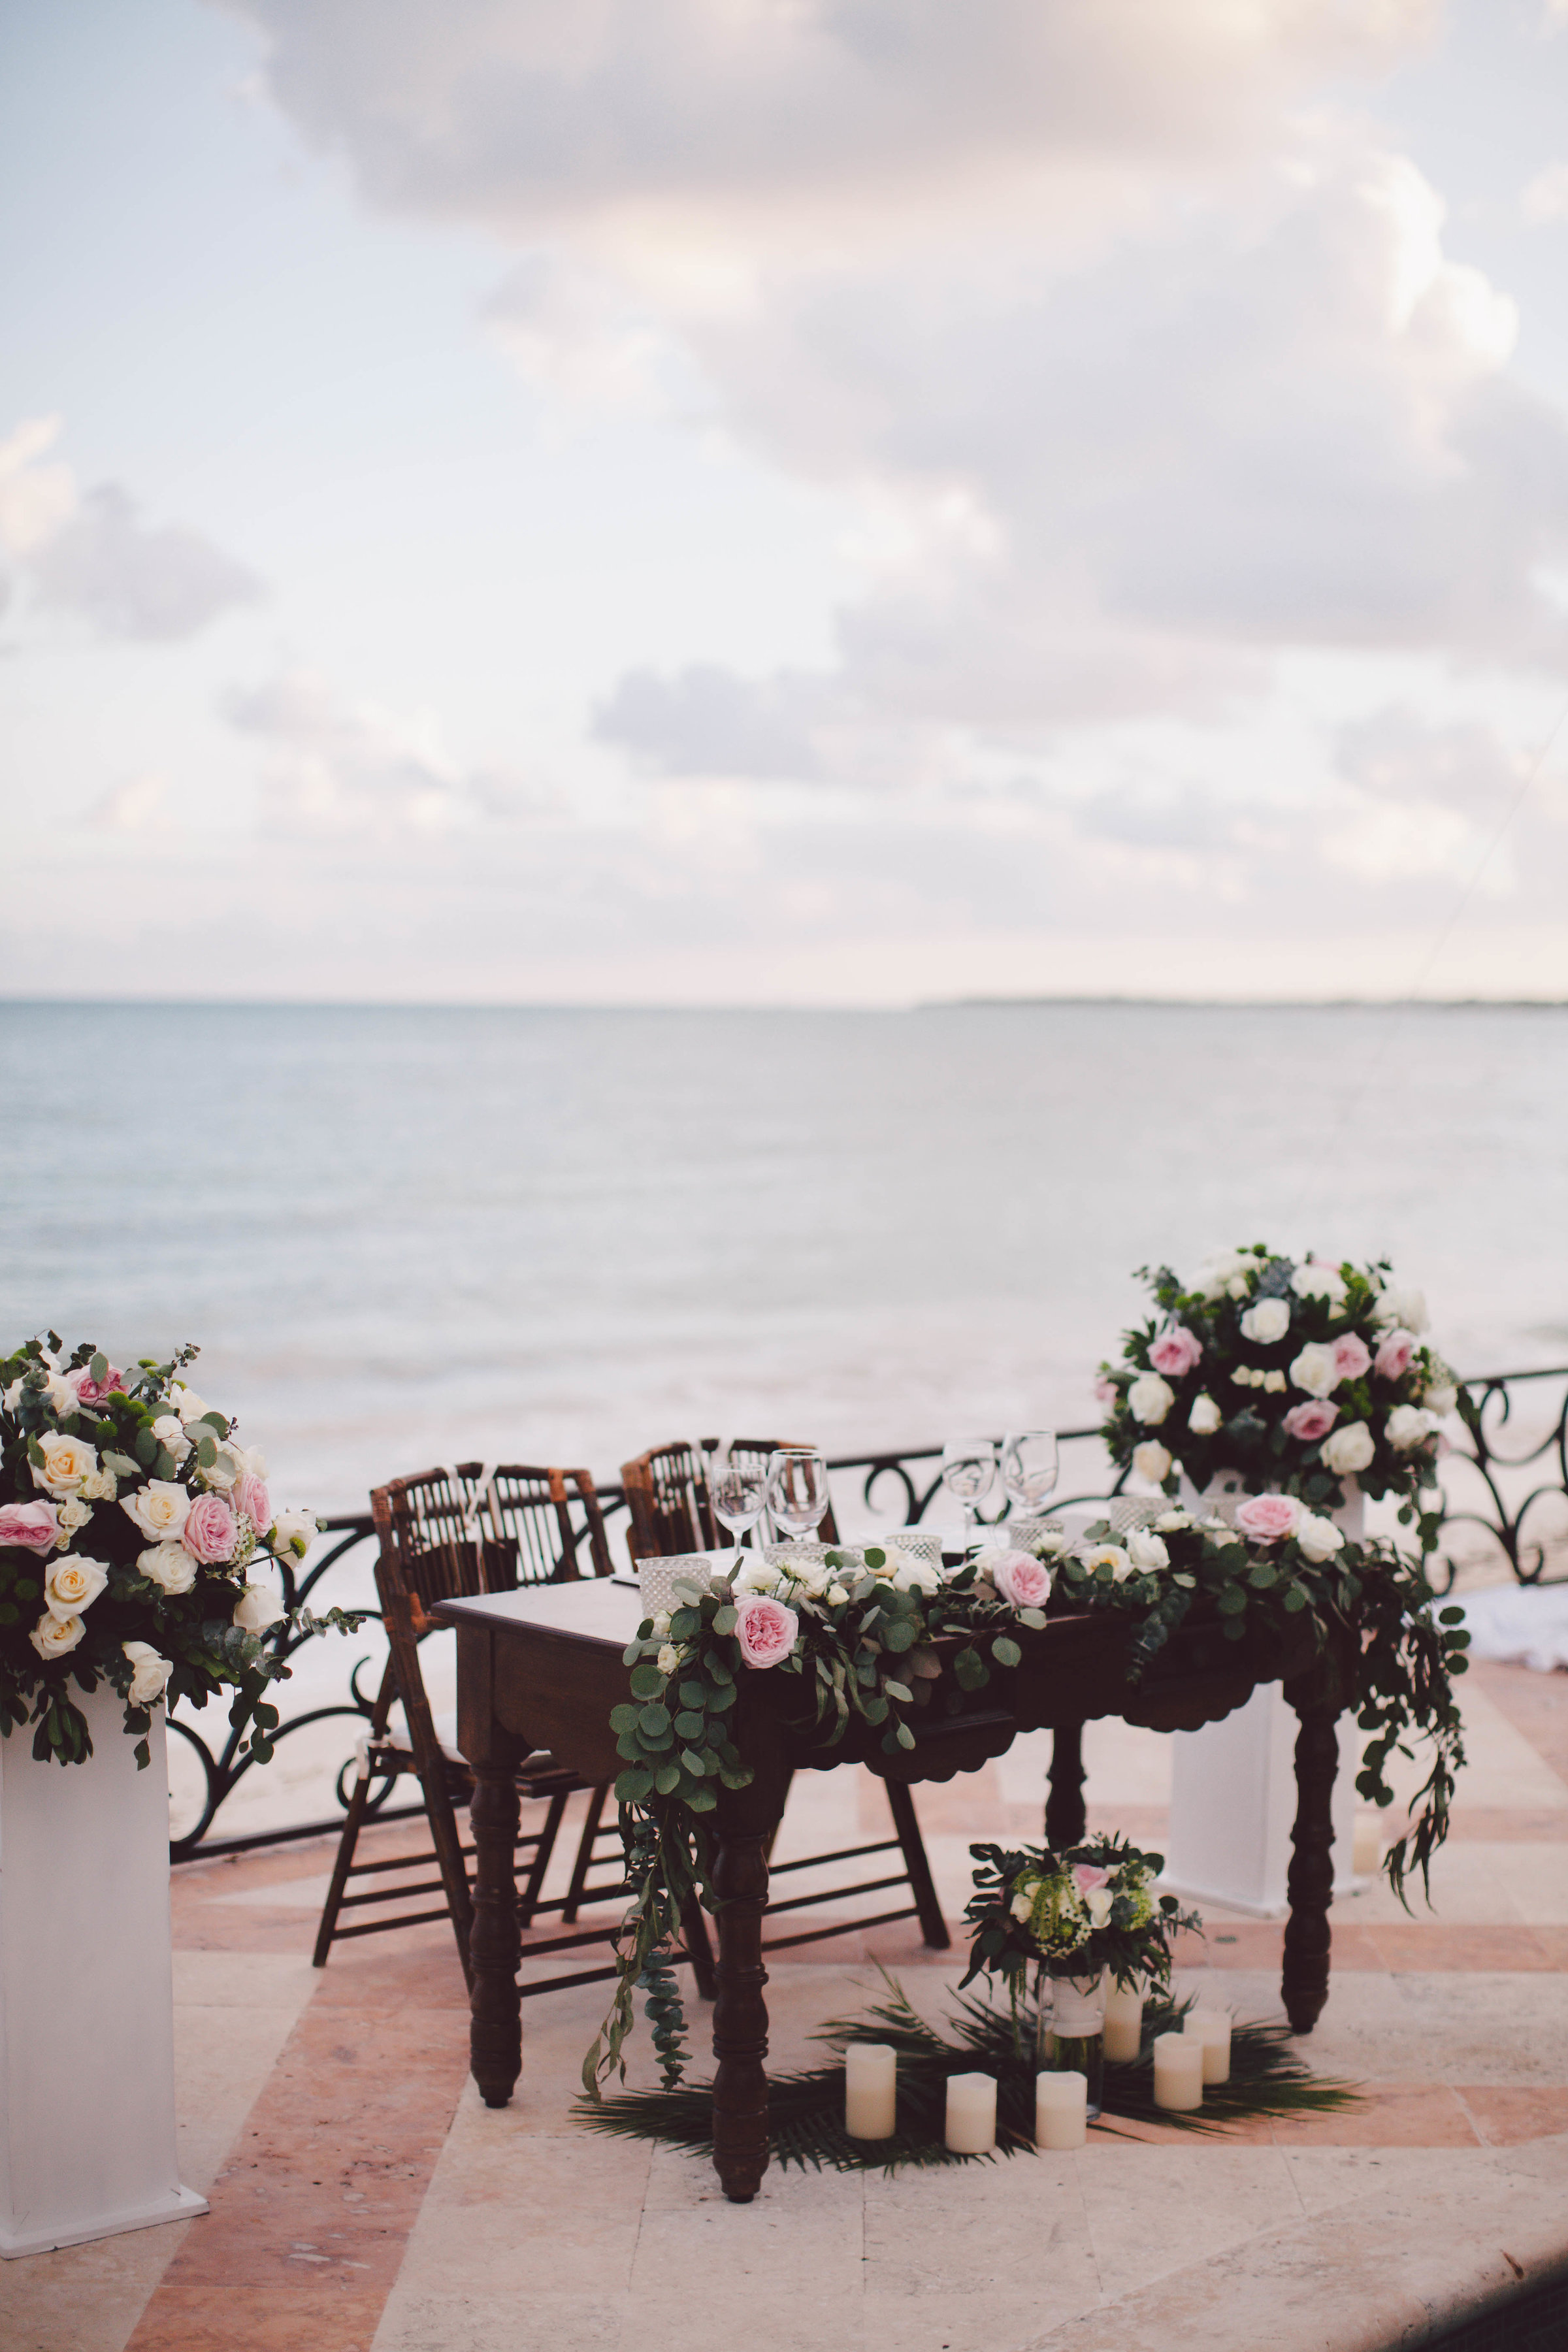 mexico_wedding_cancun_villa_la_joya_evangeline_lane_114.jpg